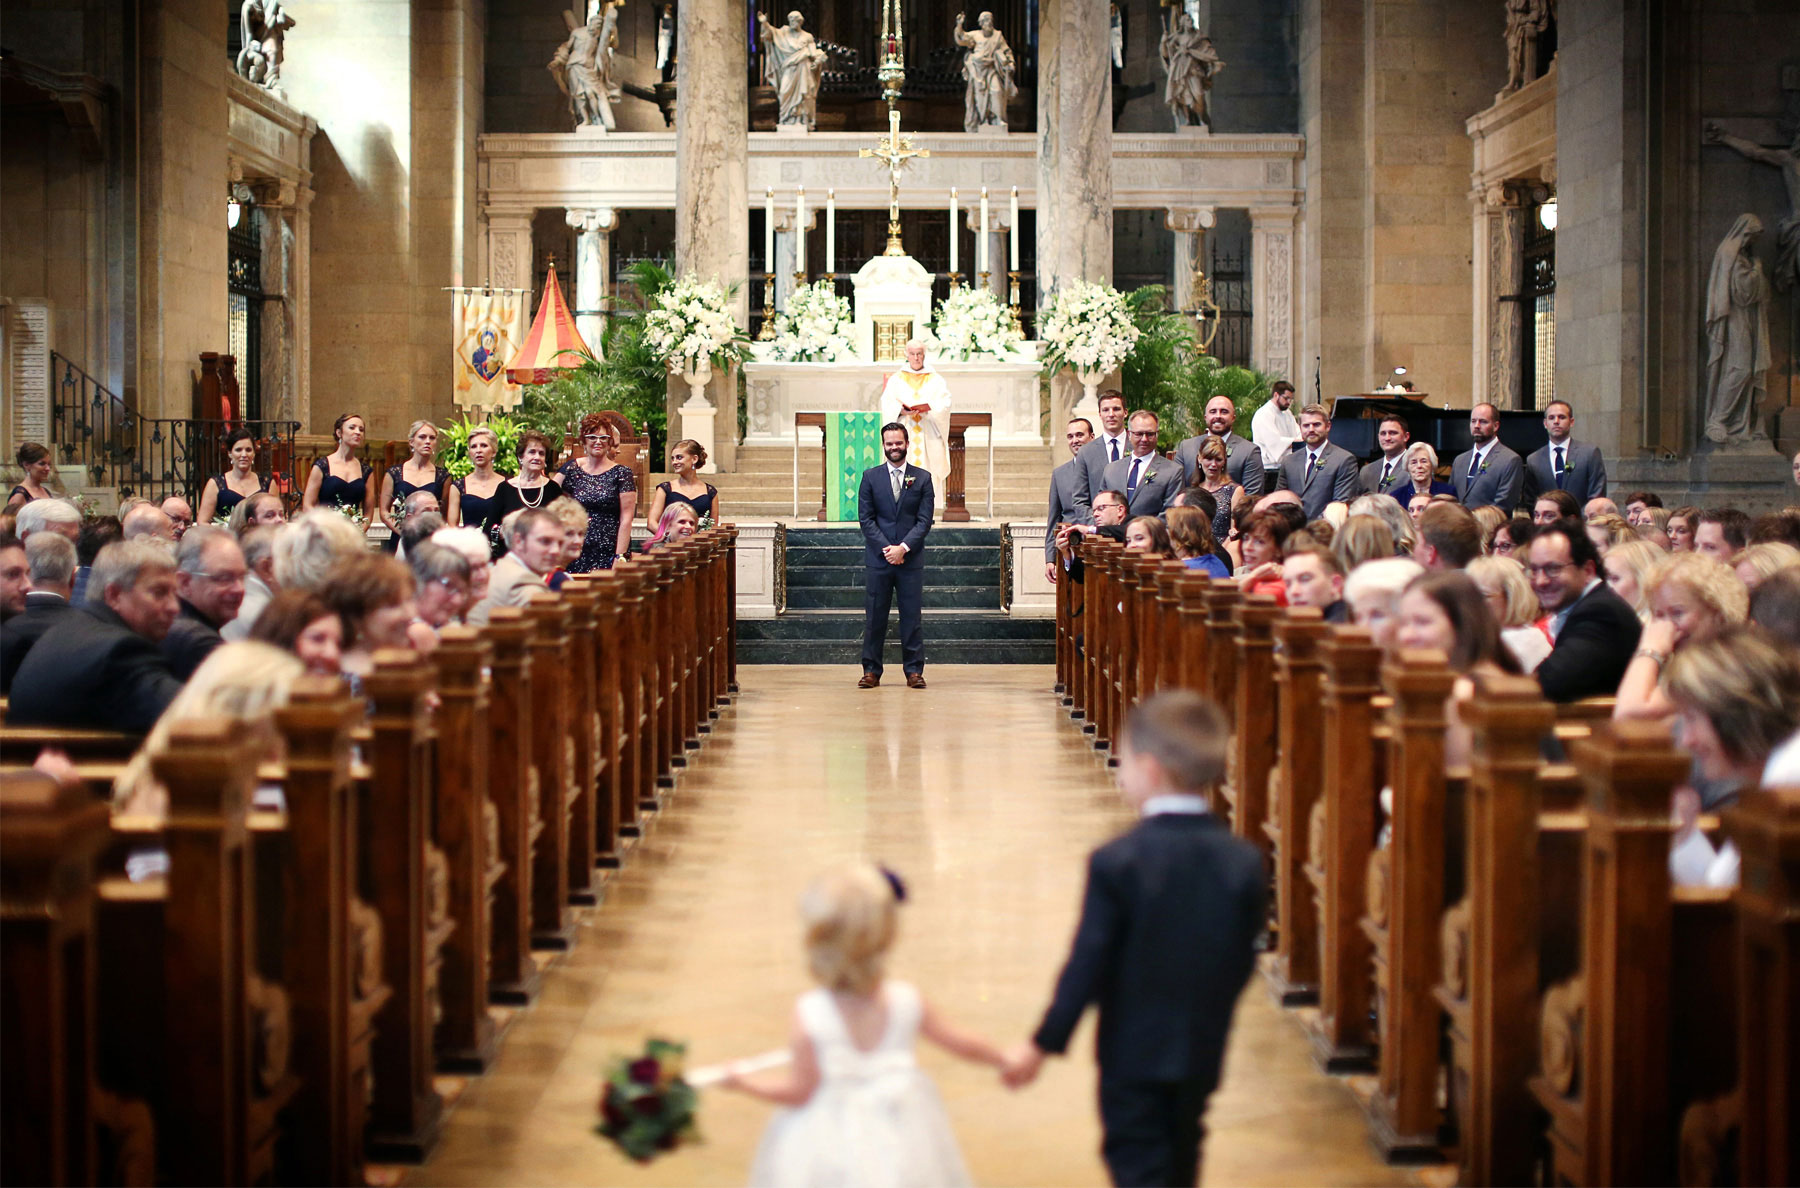 12-Minneapolis-Minnesota-Wedding-Photographer-by-Andrew-Vick-Photography-Summer-Basilica-of-Saint-Mary-Church-Ceremony-Groom-Flower-Girl-Ring-Bearer-Aisle-Ashley-and-Eric.jpg